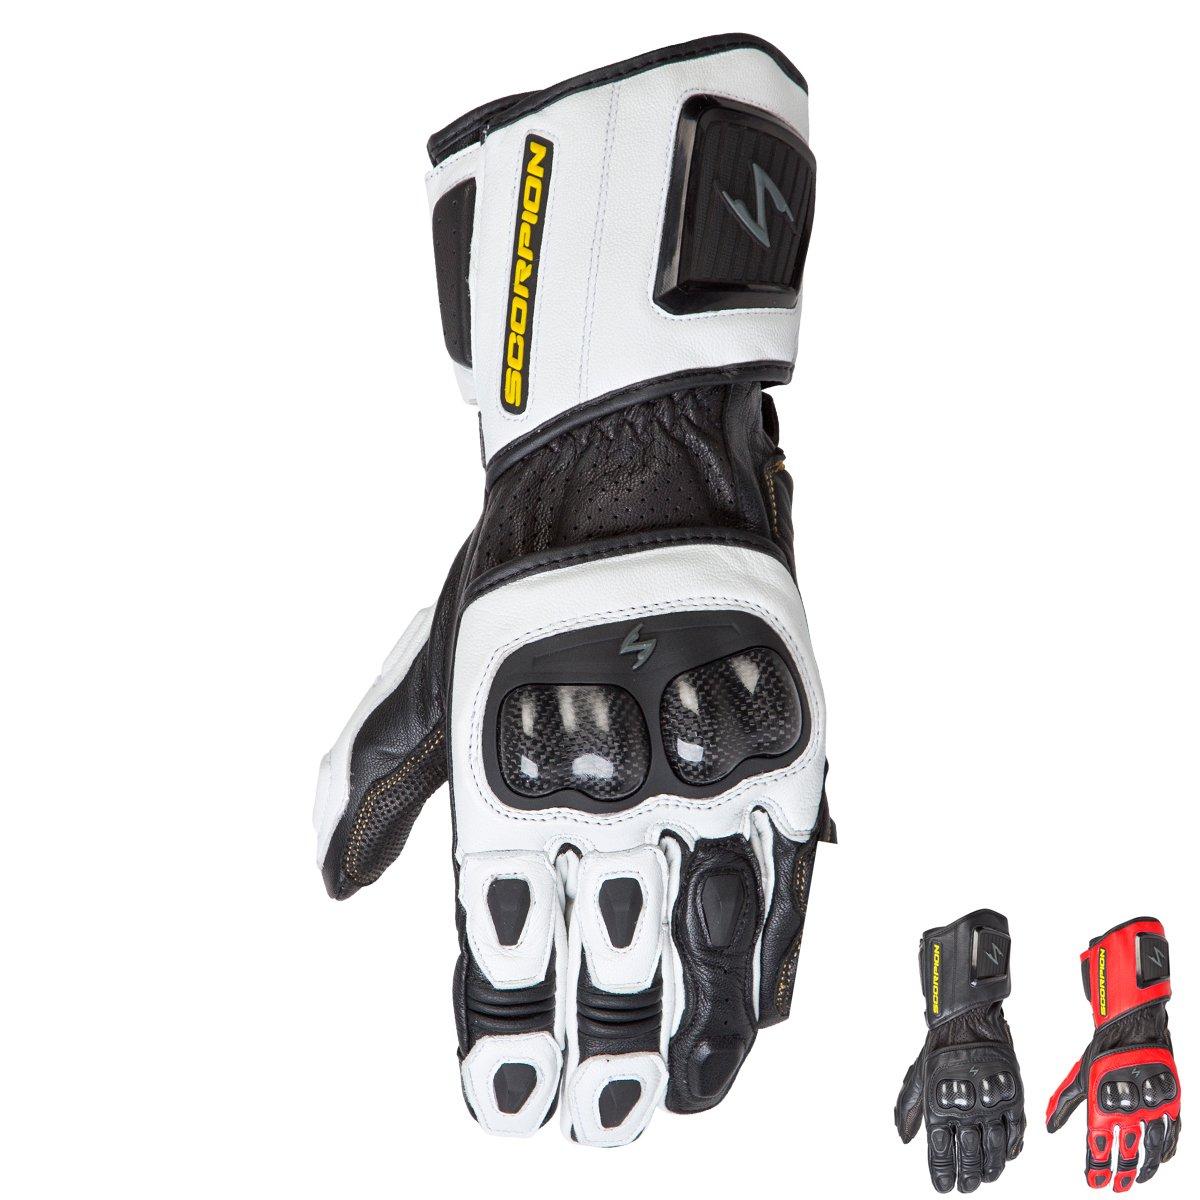 ScorpionExo SG3 MKII Men's Long Gauntlet Sport Gloves (White, X-Large)